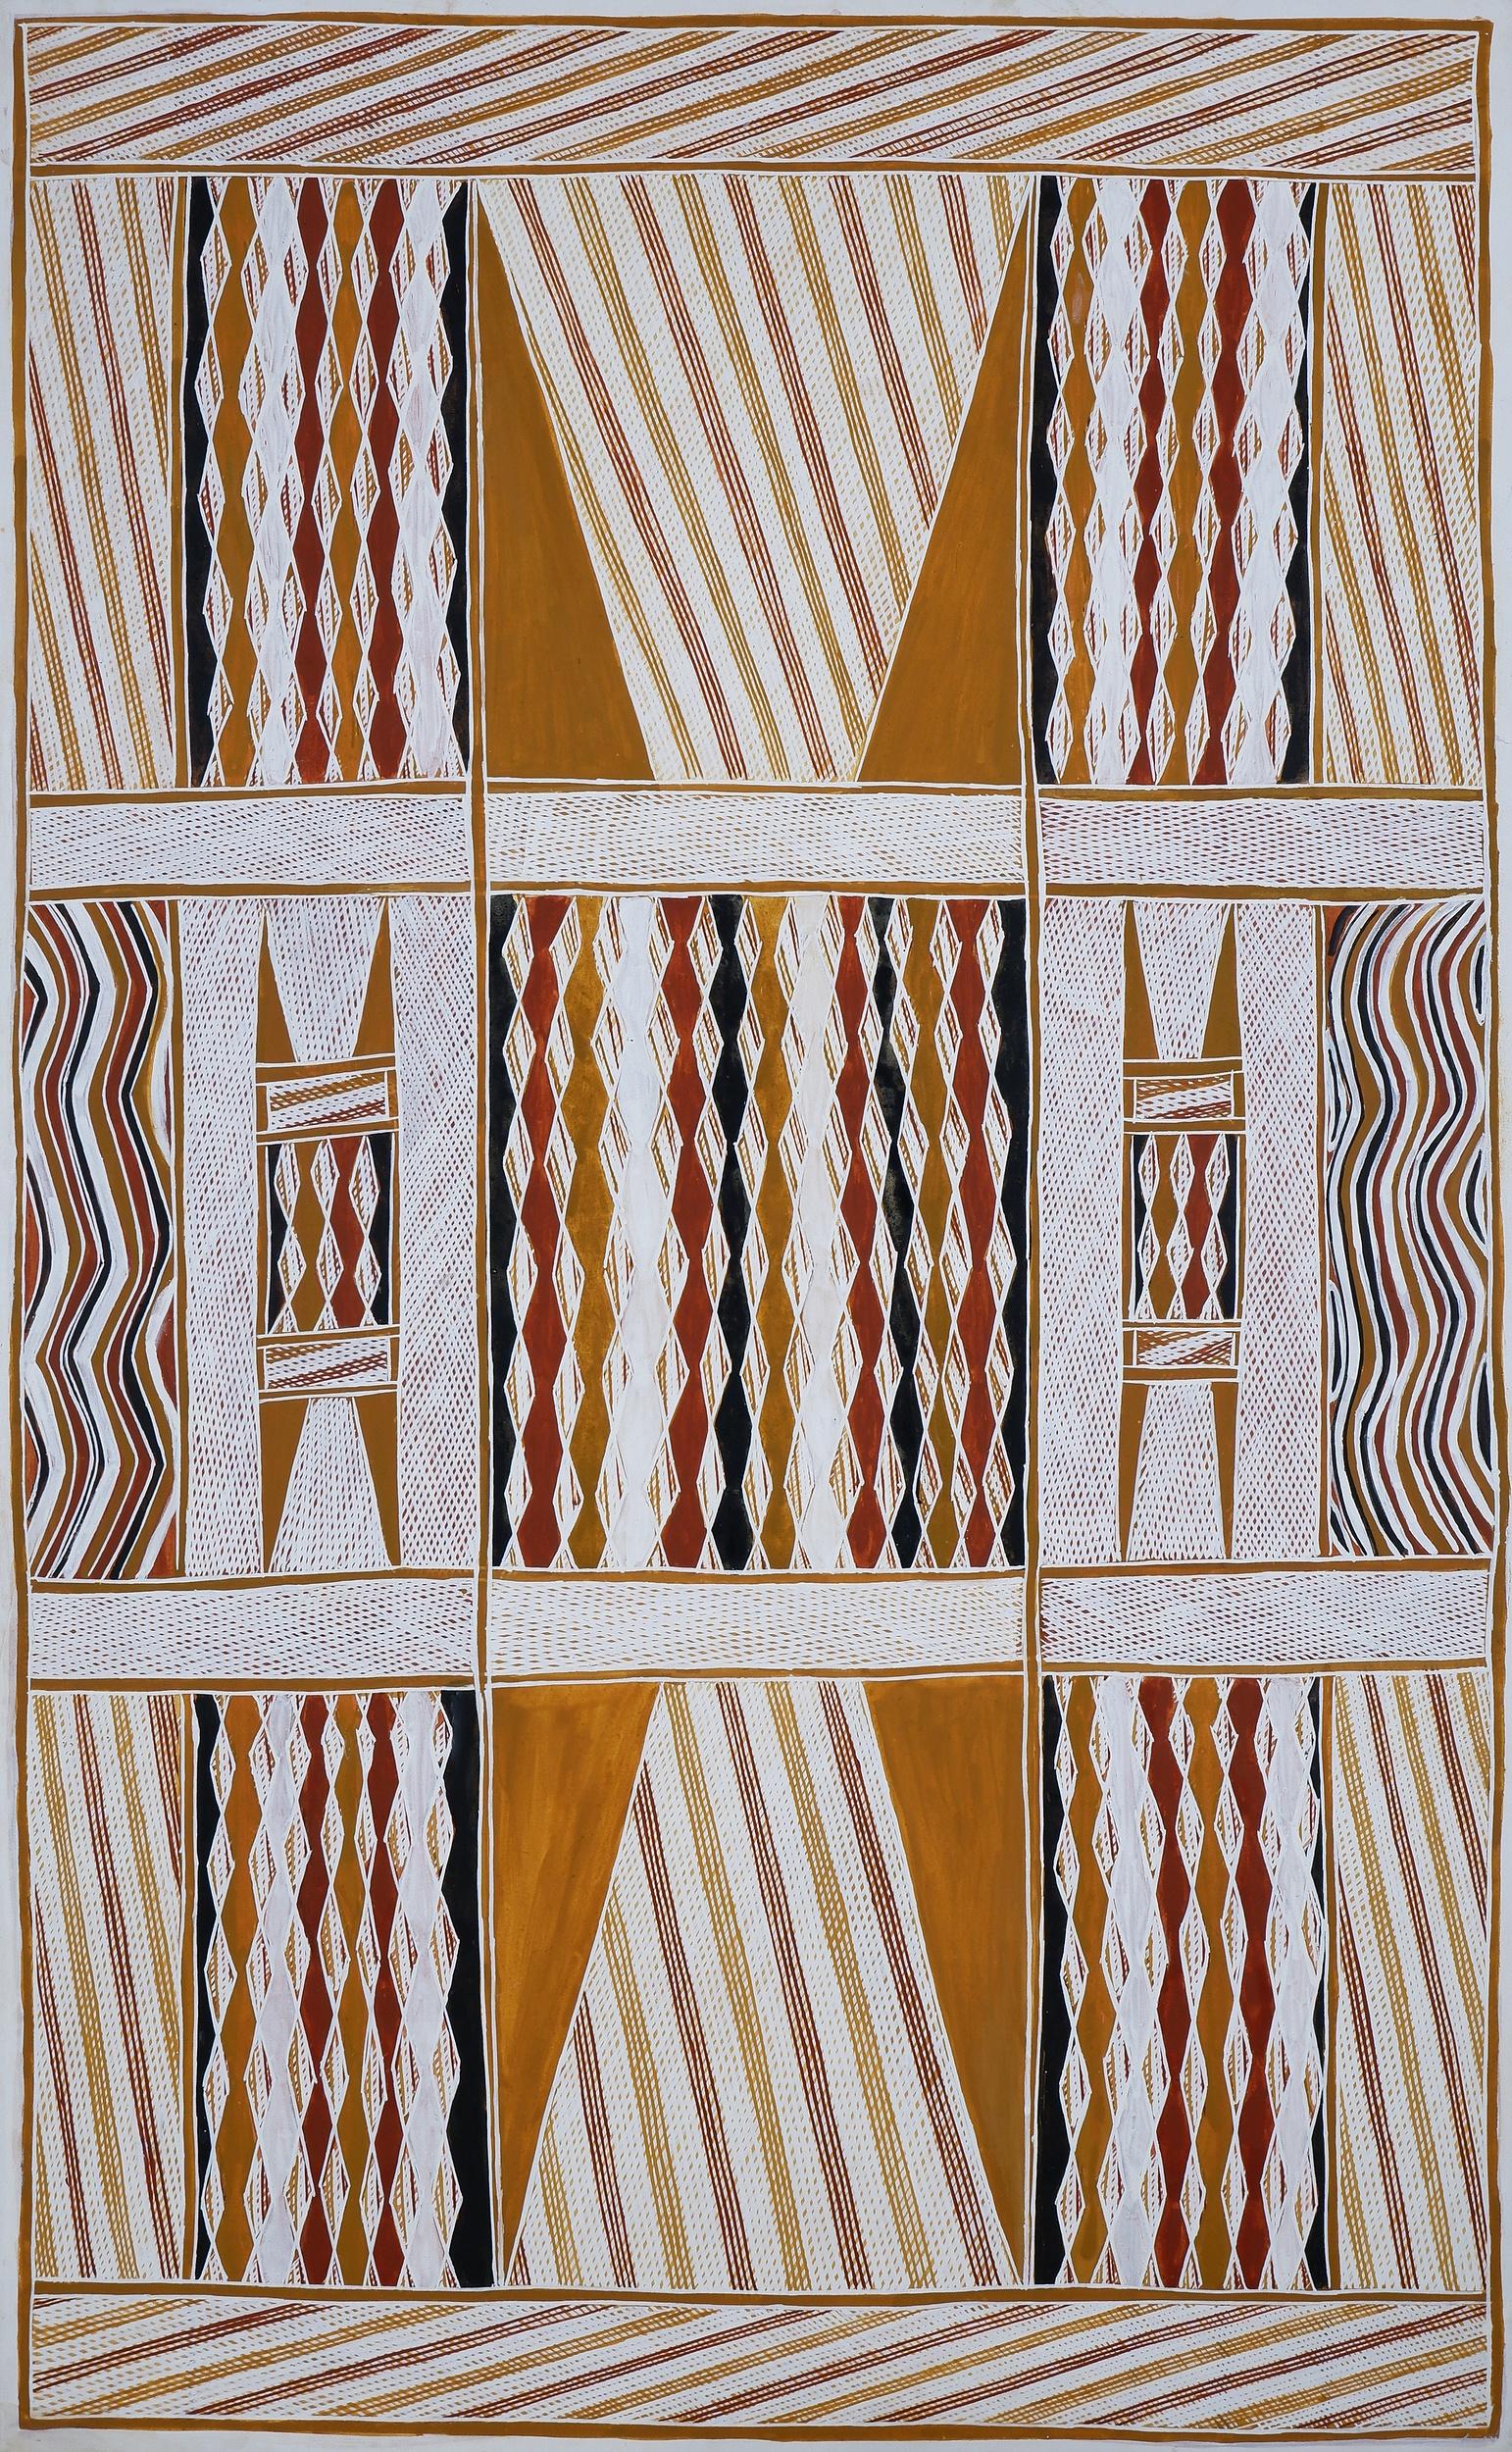 'Raymond Bulambula (born 1945, Wobulkarra/Manjikay language group), Dhukurrurru at Milaway (Sacred Rock), Natural Ochre on Canvas, 180 x 111 cm'